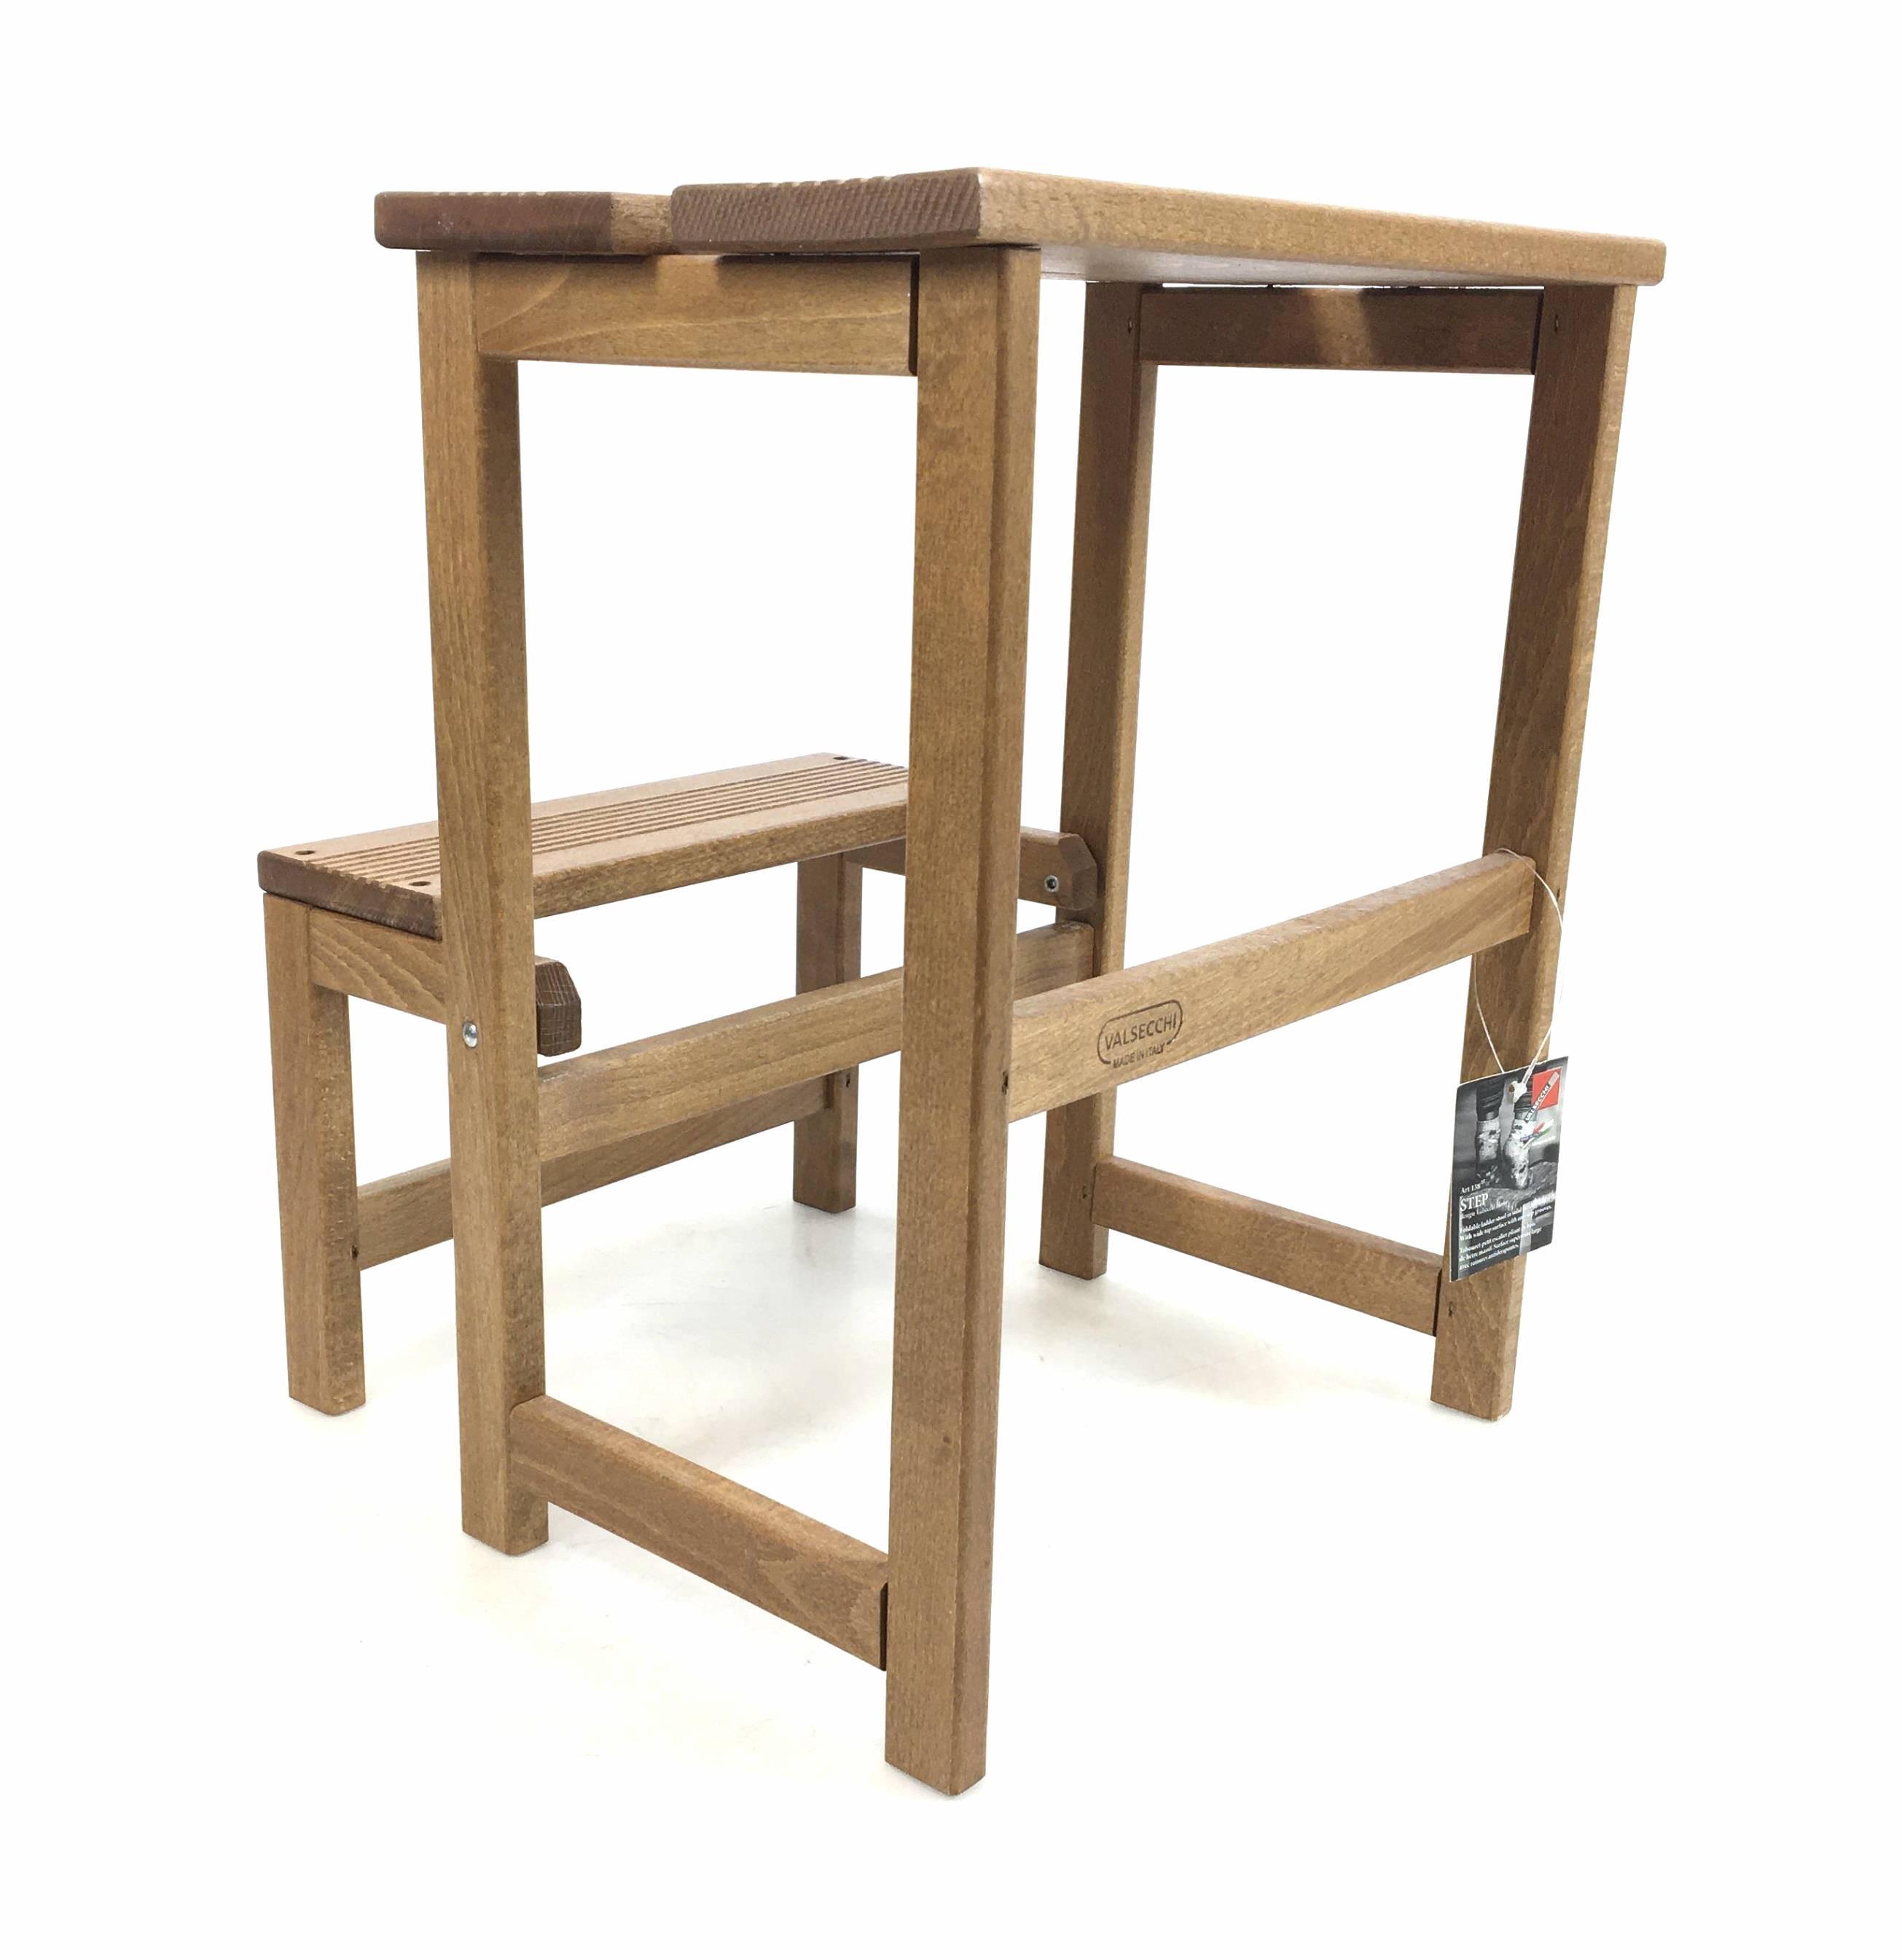 Valsecchi Beechwood Foldable Ladder/ Stool